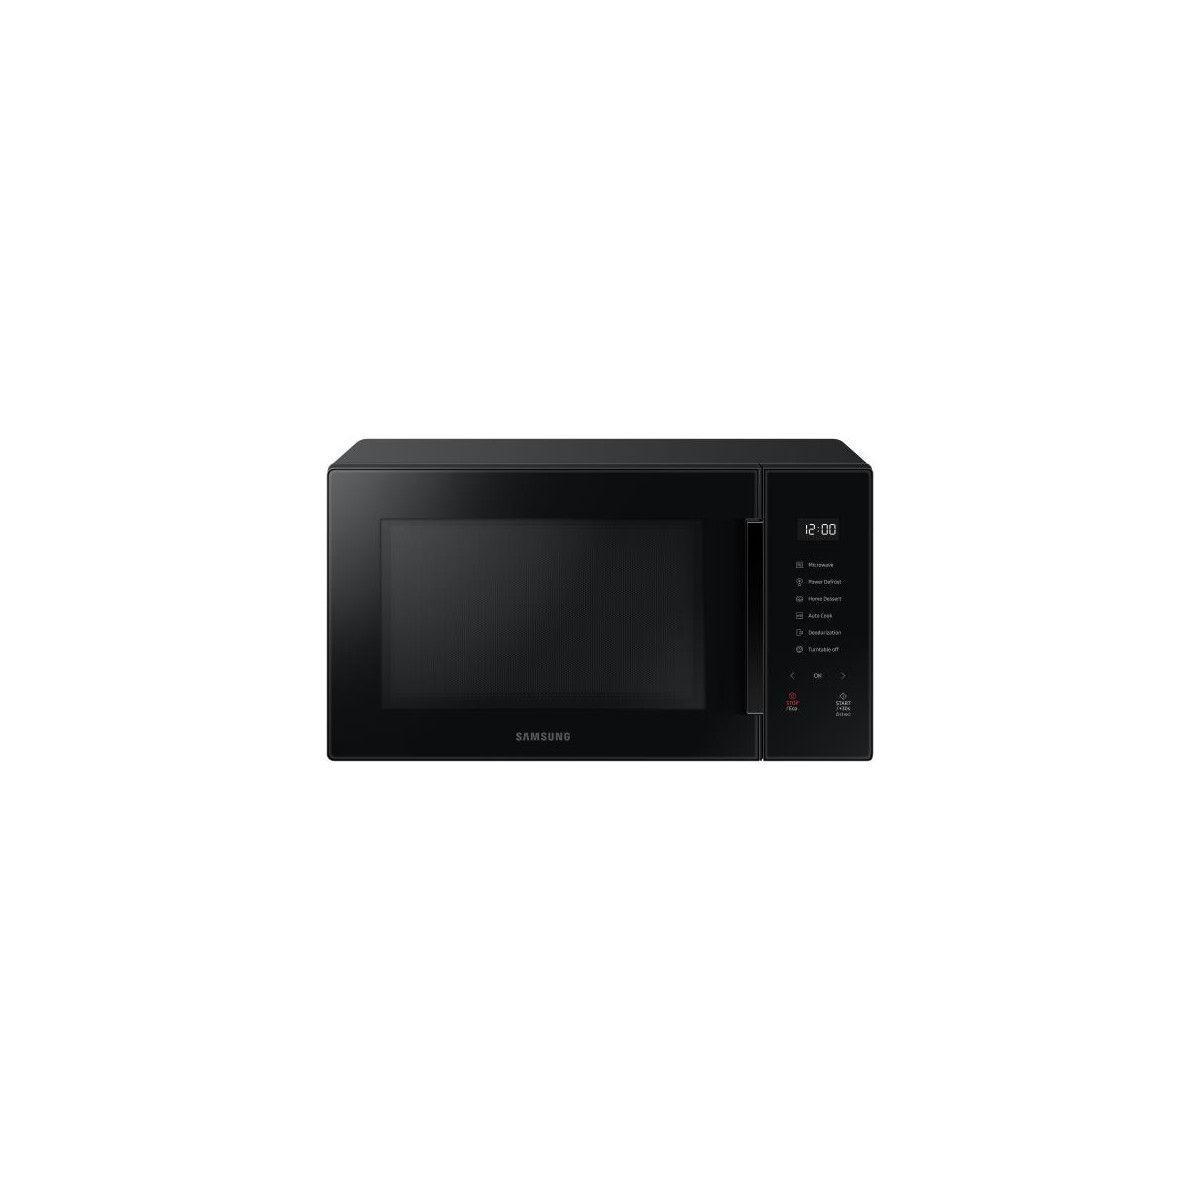 Samsung Micro-ondes Pose Libre 30l Samsung 1000w 51.7cm, Ms30t5018ak